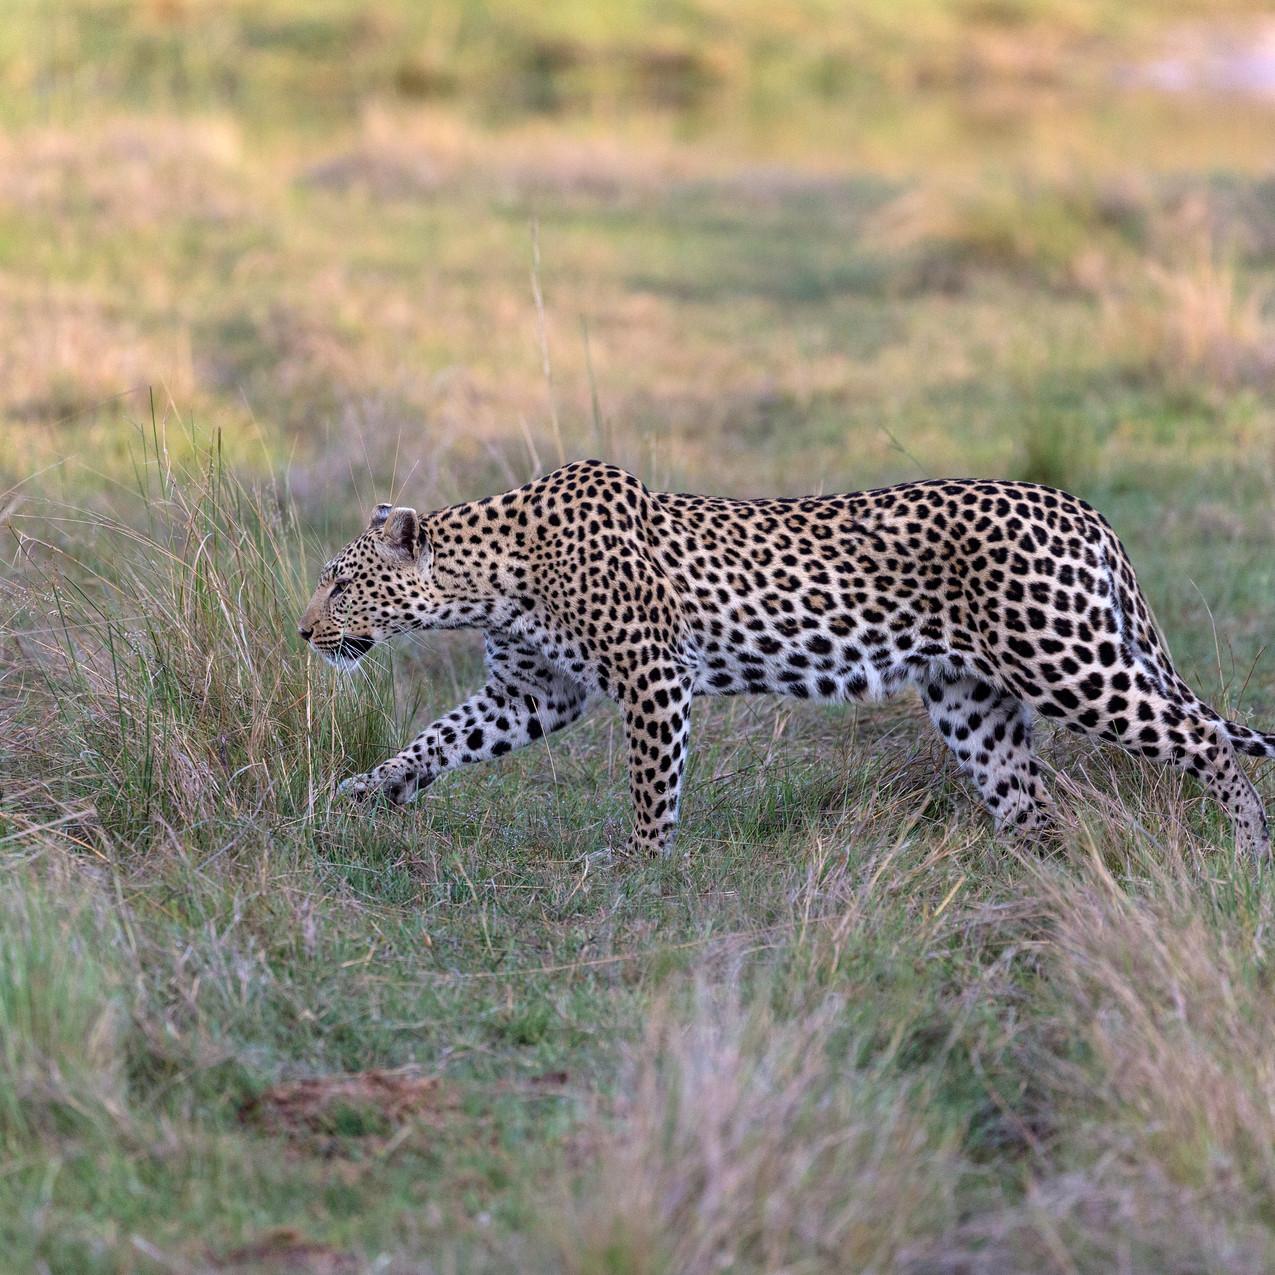 Leopard hunt 2